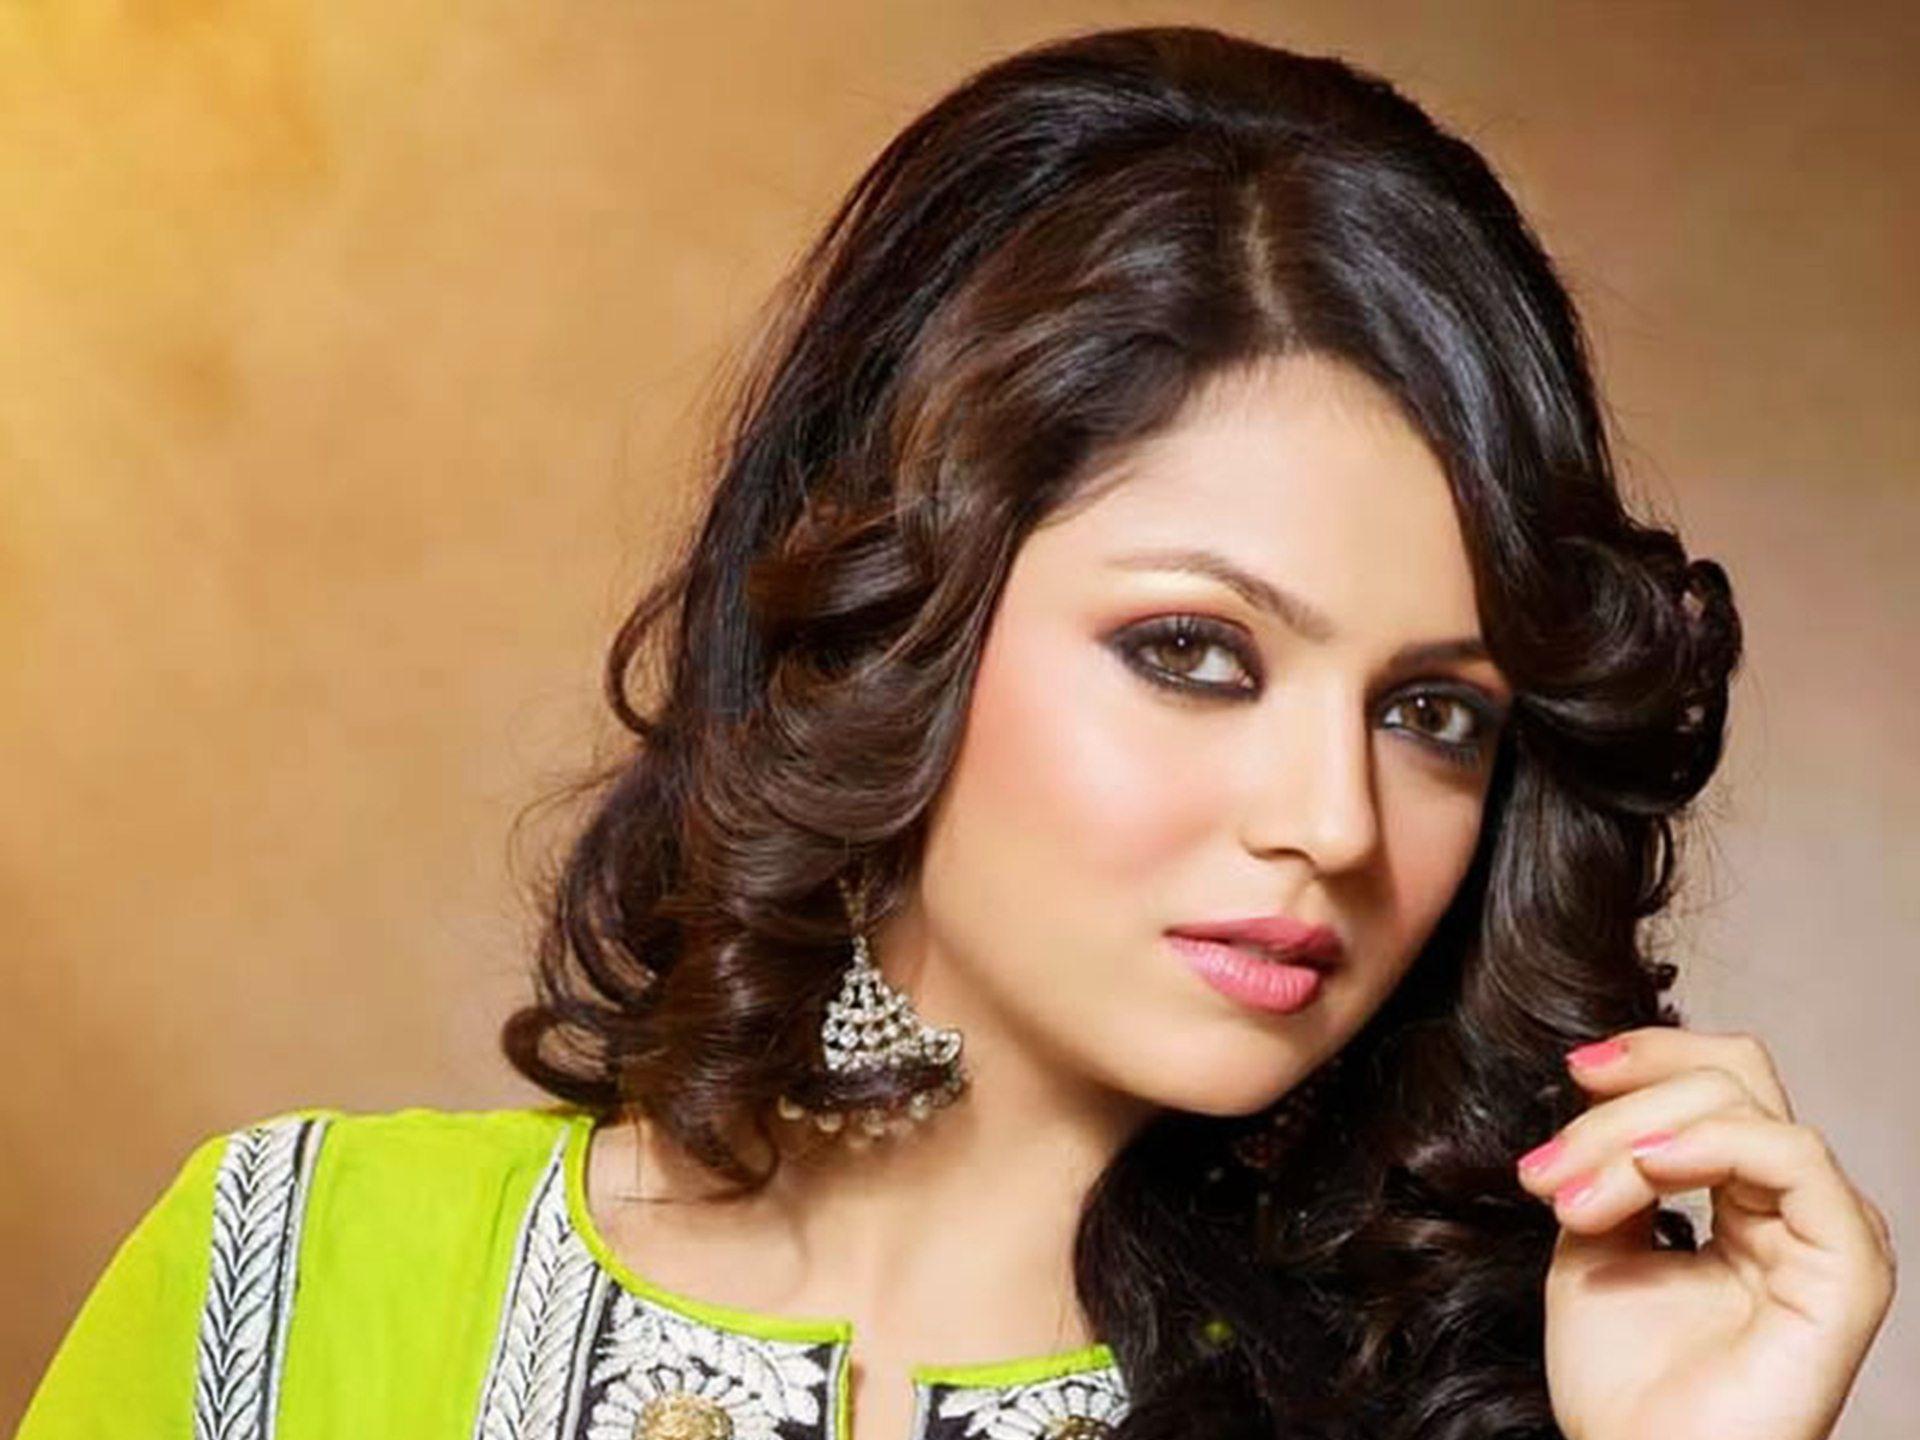 بالصور اجمل هنديه , صور اجمل الممثلات الهنديات 3581 10